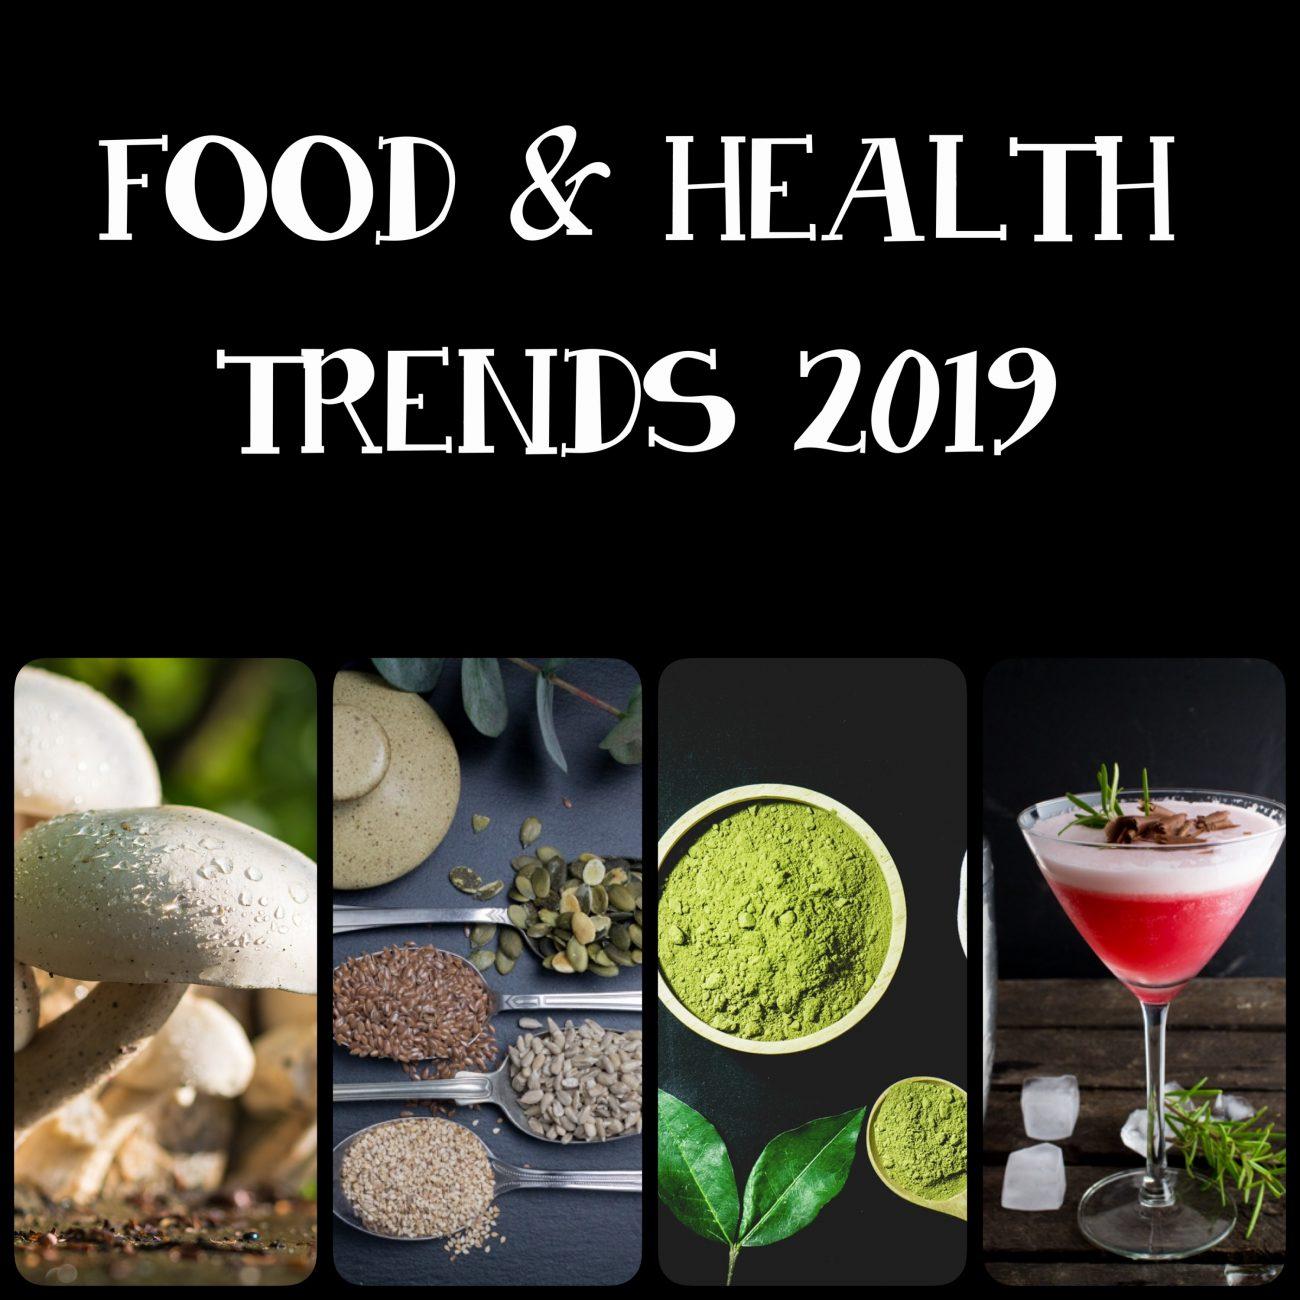 Food & Health trends 2019